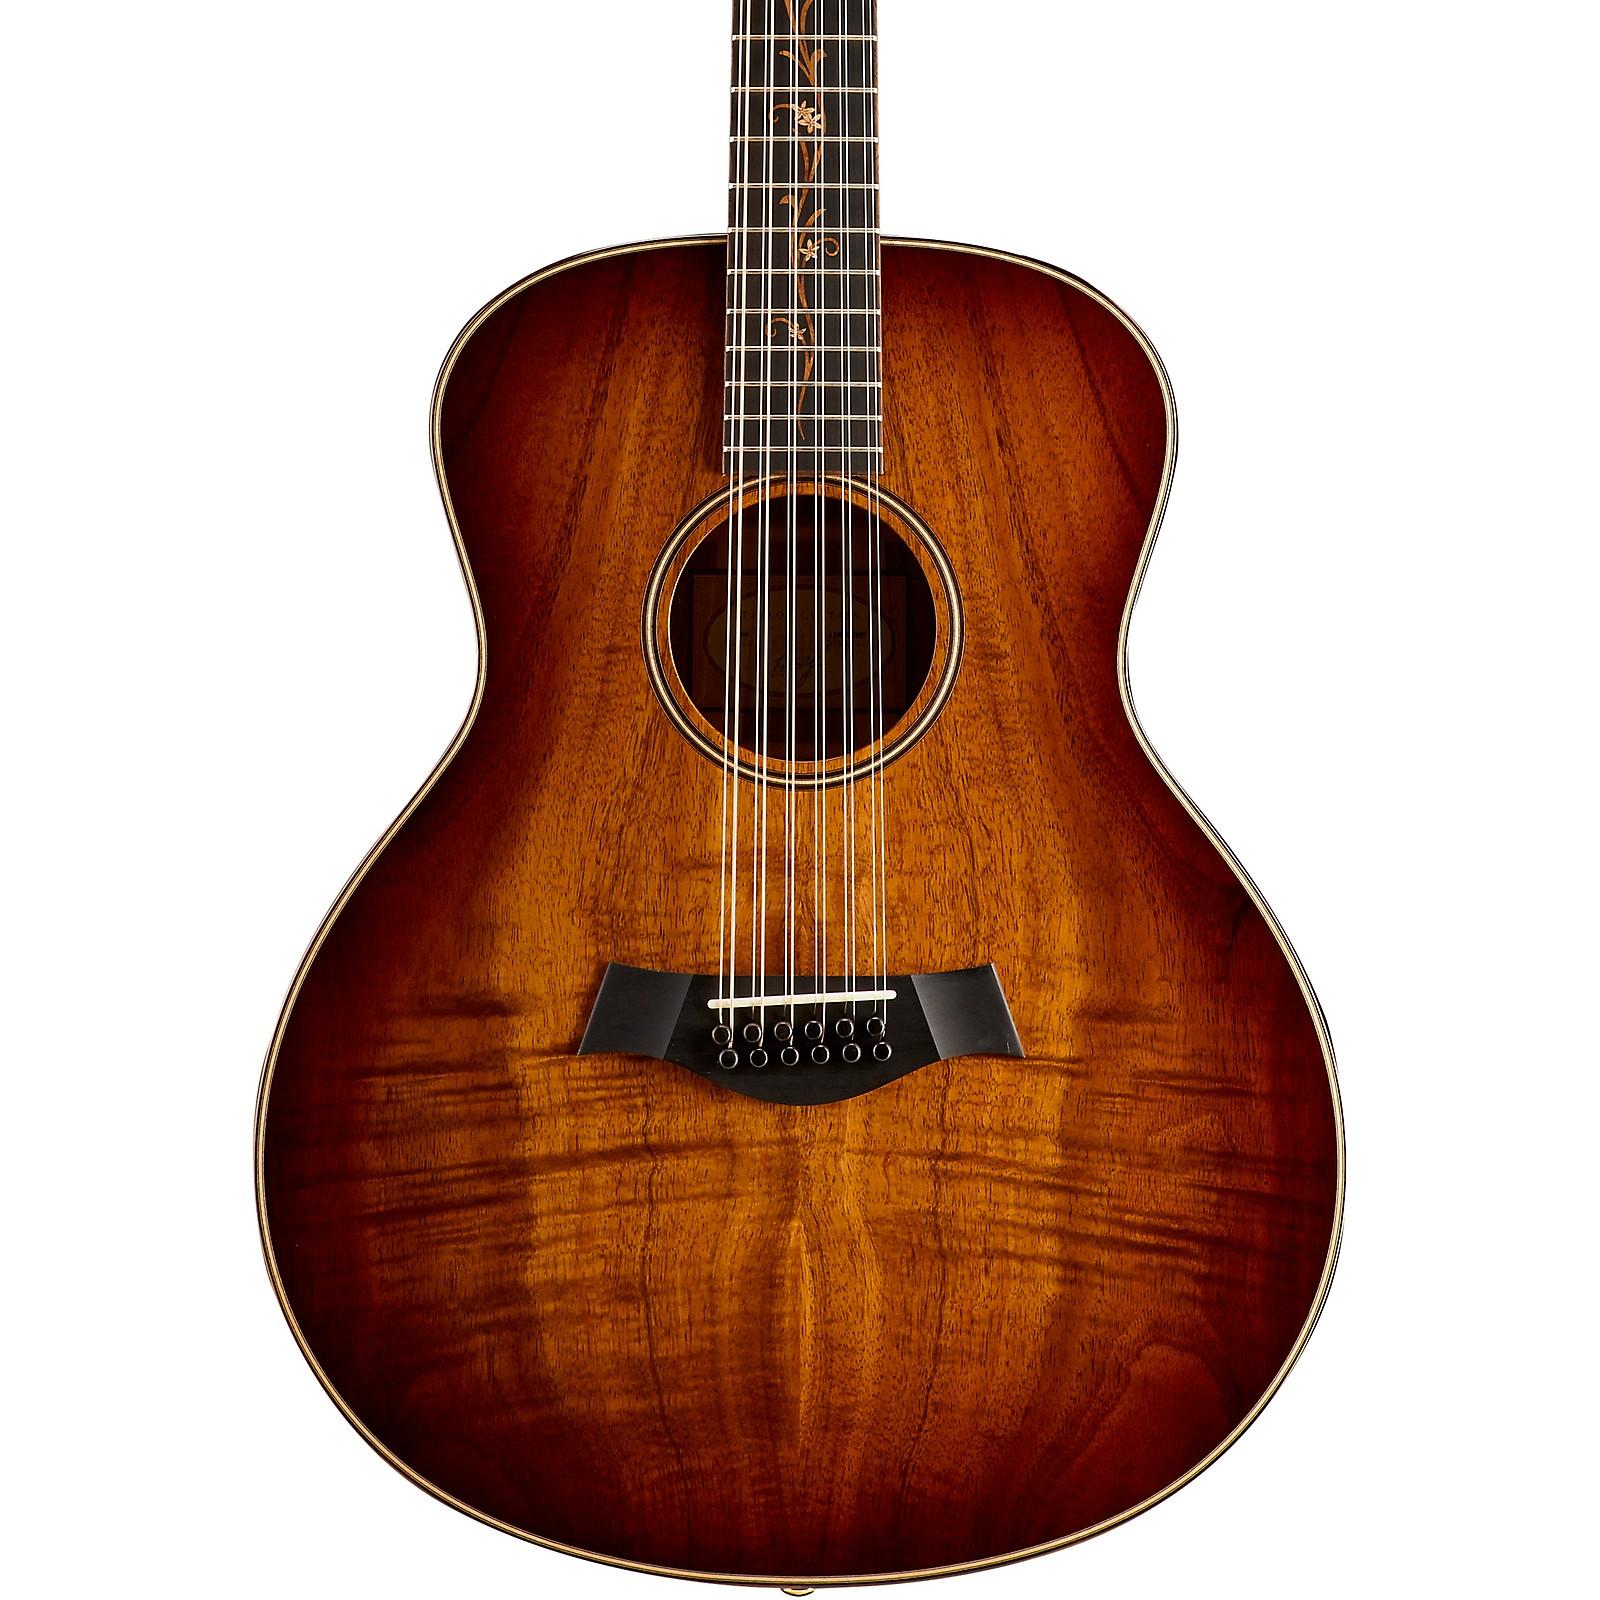 Taylor Koa Series K66 Koa Grand Symphony 12-String Acoustic Guitar